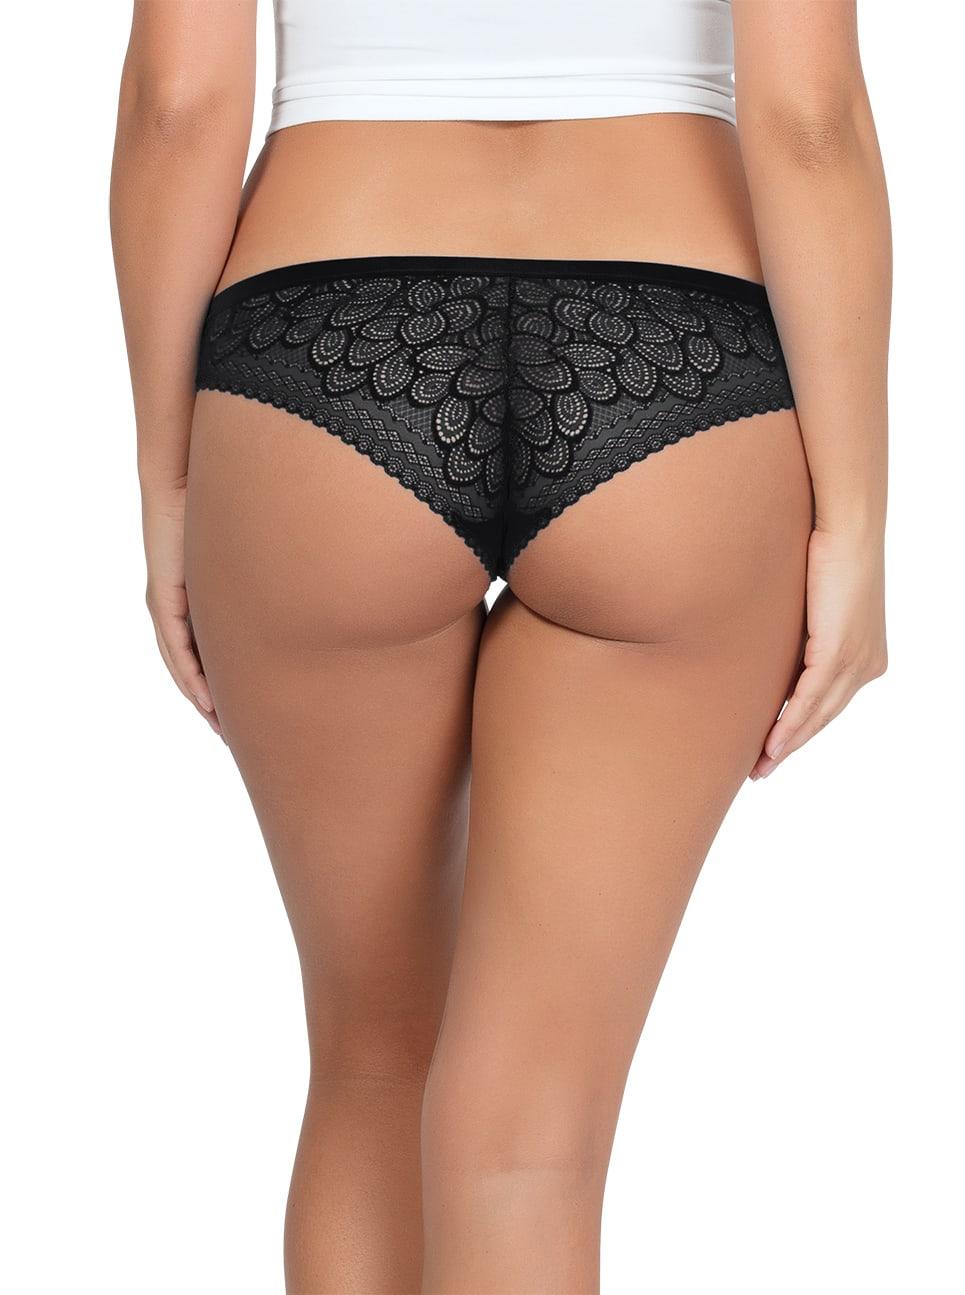 ParfaitPanty SoGlam BikiniPP302 Black back - Panty So Glam Bikini - Black - PP302